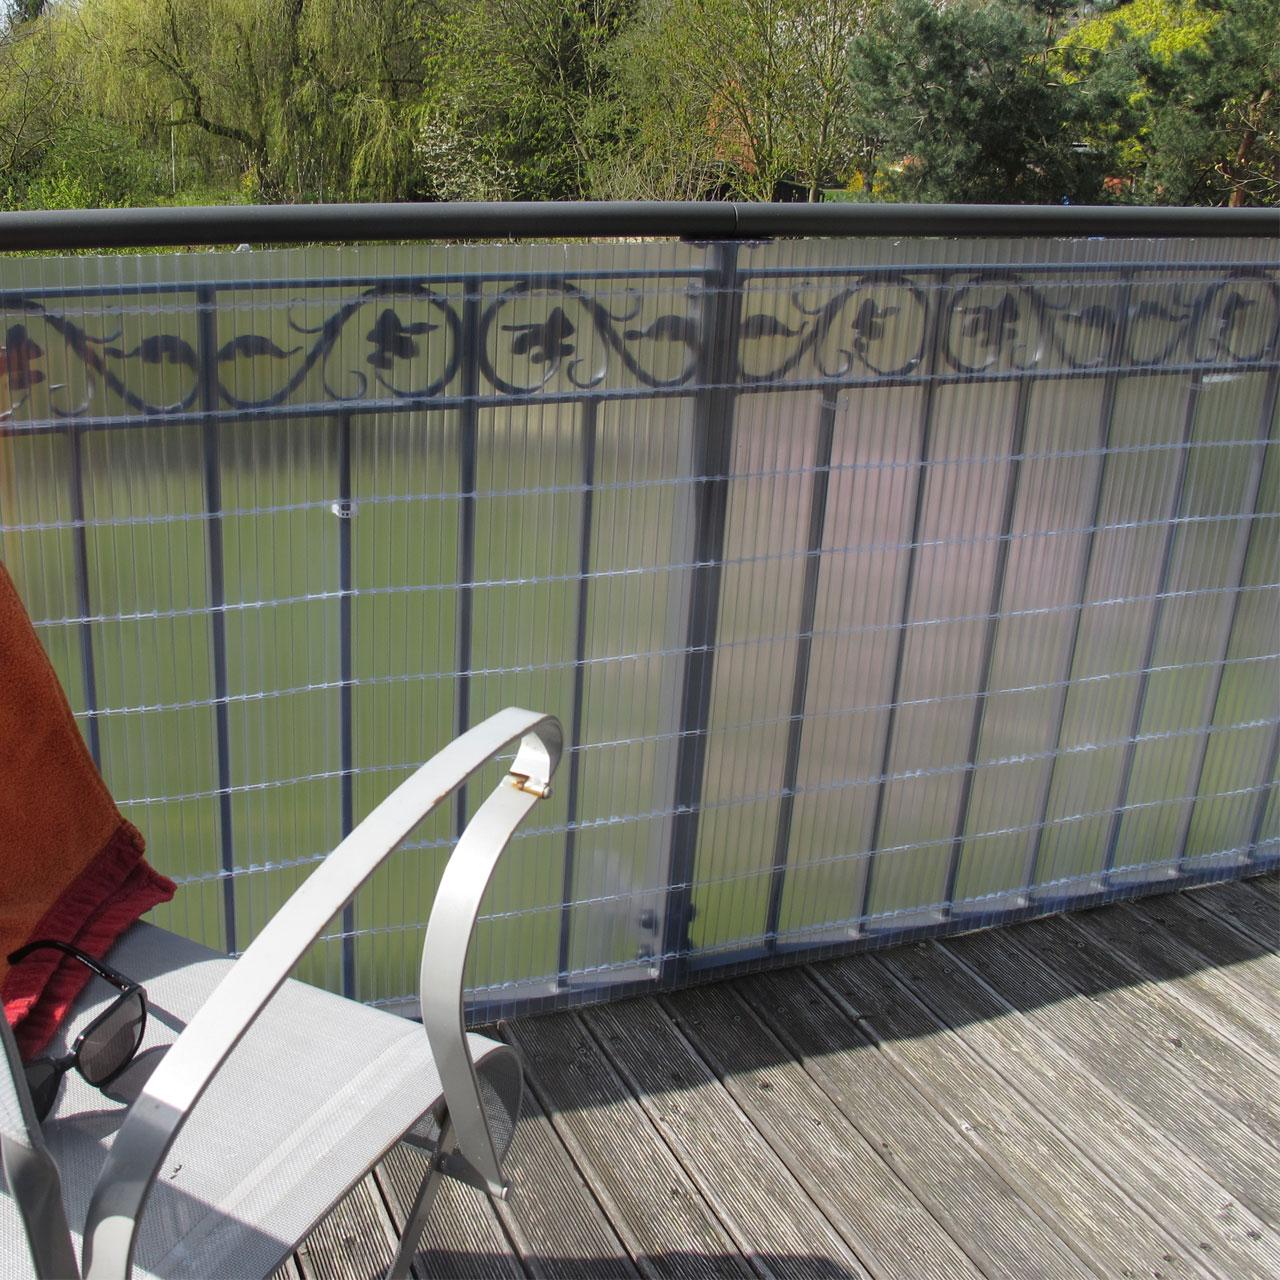 Sichtschutzmatte Kunststoff Sunline Transparent Balkonerlebnis De